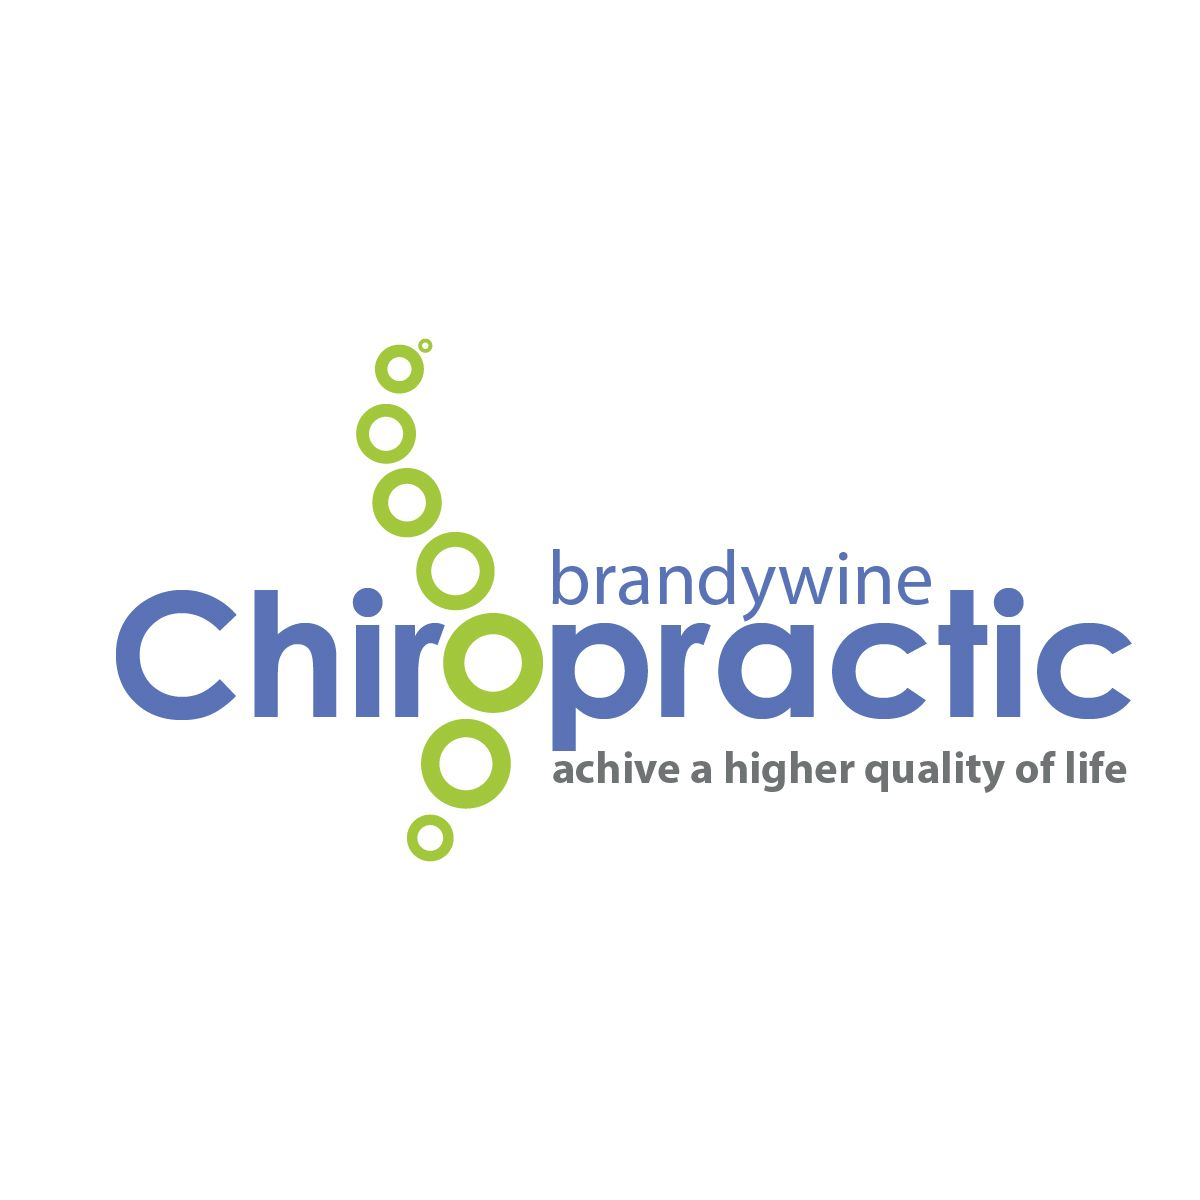 chiropractor logo design service physio logos chiropractic logos designs free chiropractic logos designs